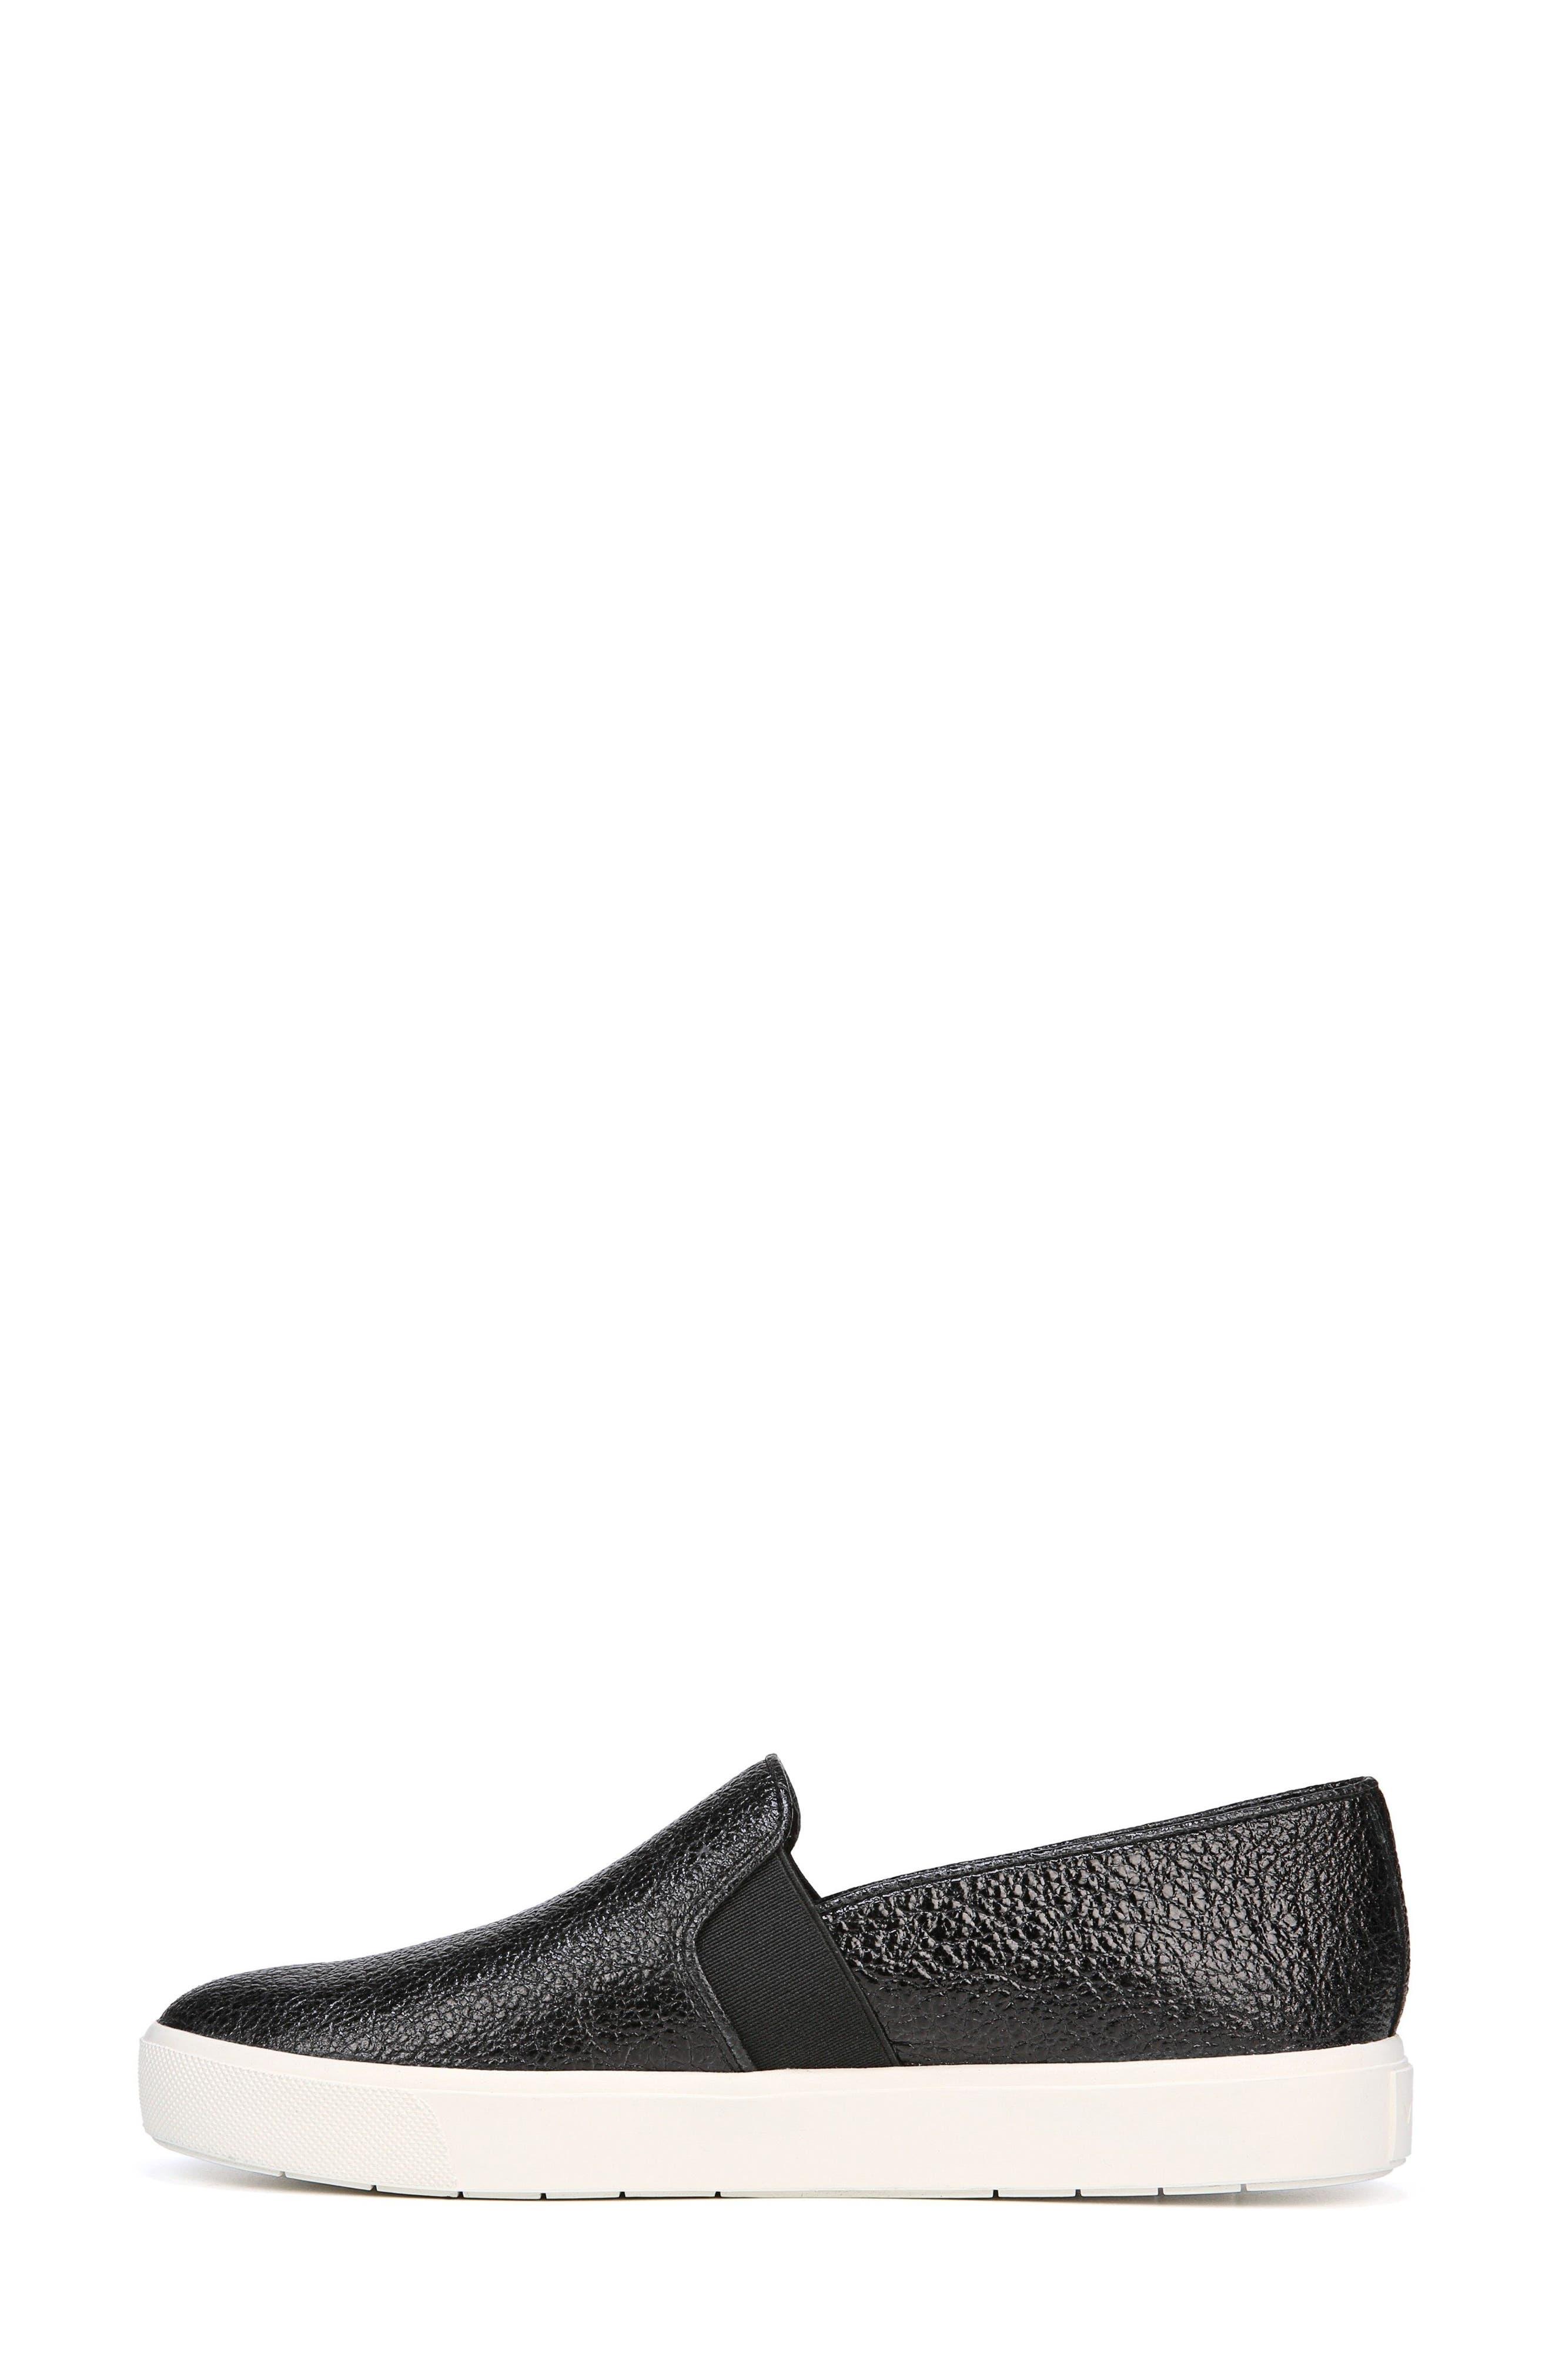 'Blair 12' Leather Slip-On Sneaker,                             Alternate thumbnail 6, color,                             BLACK LEATHER